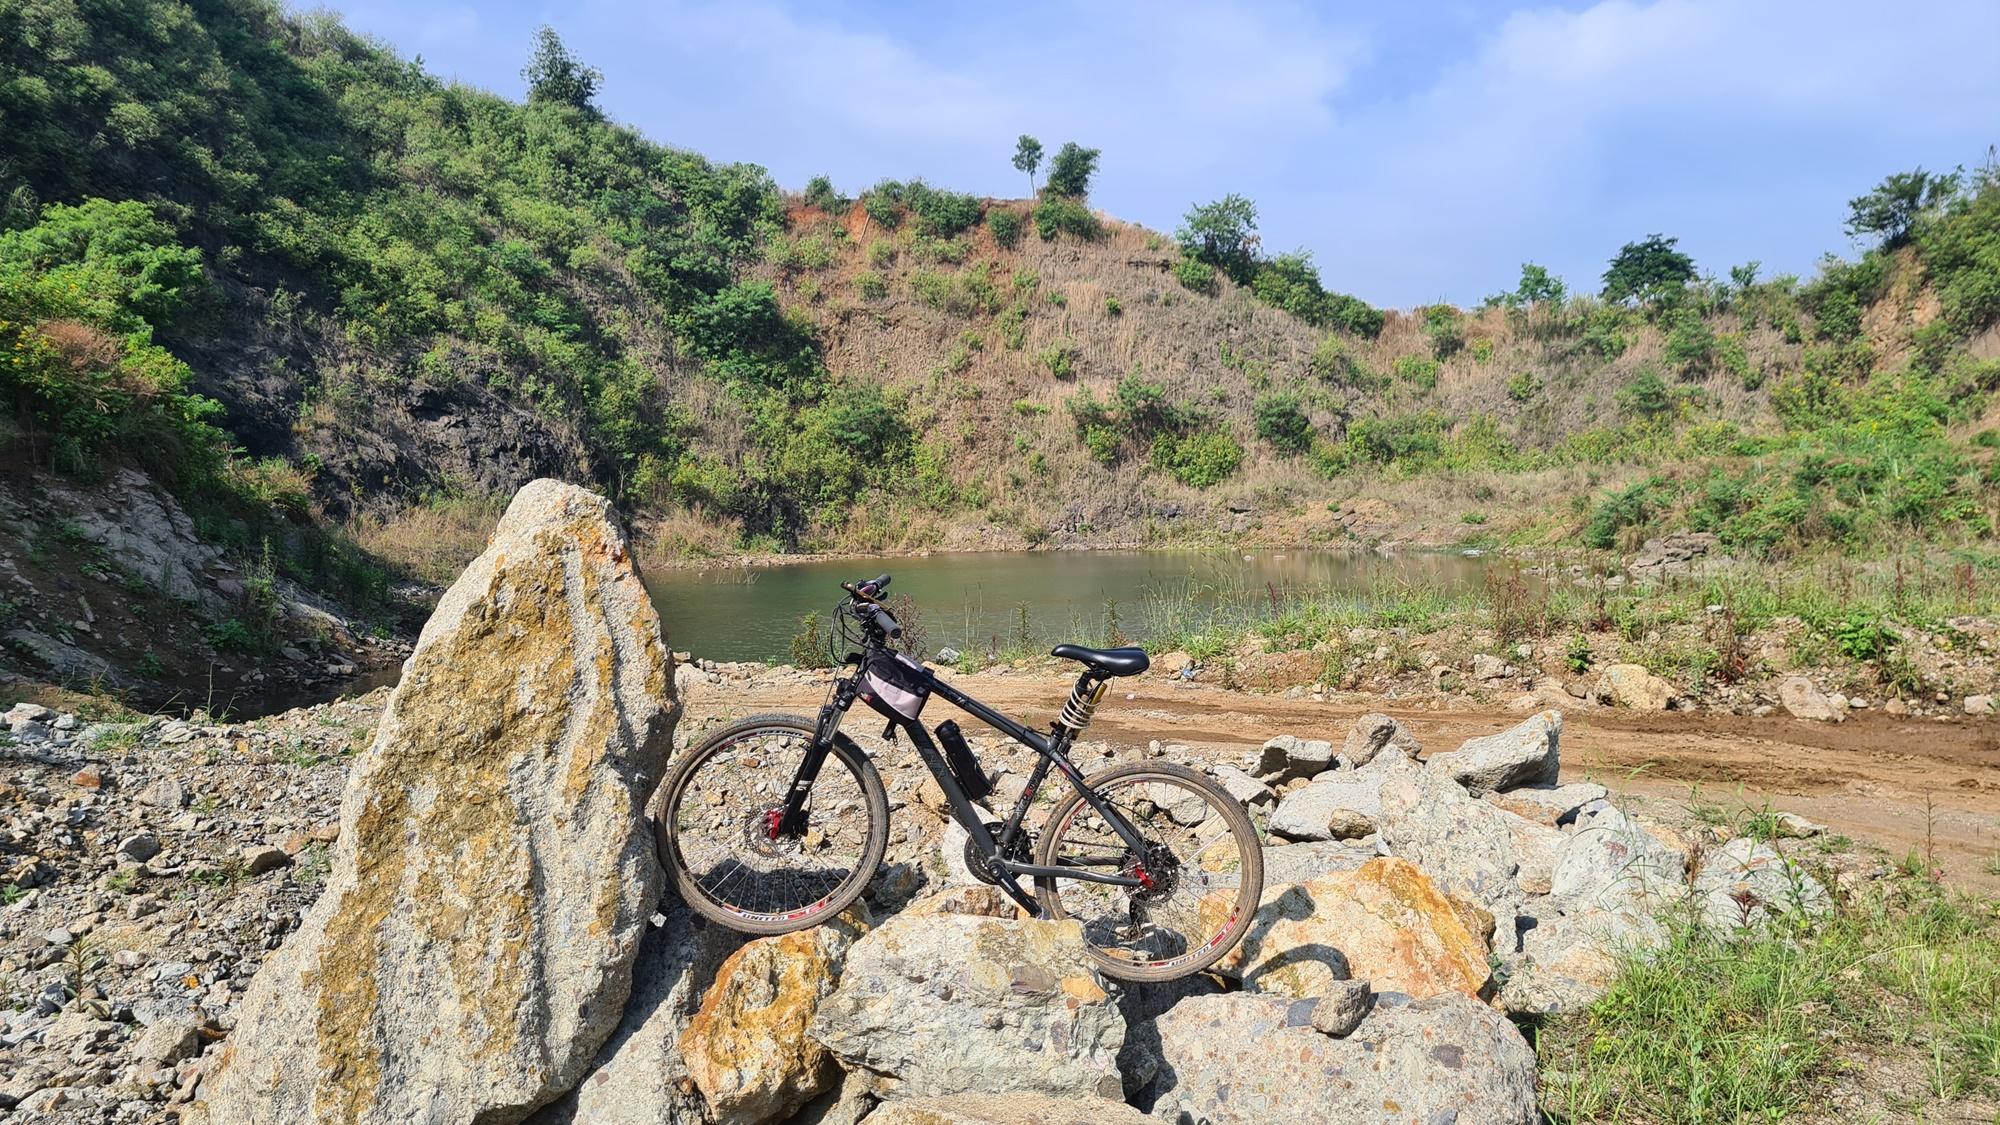 Bersepeda ke Danau Wakadobol